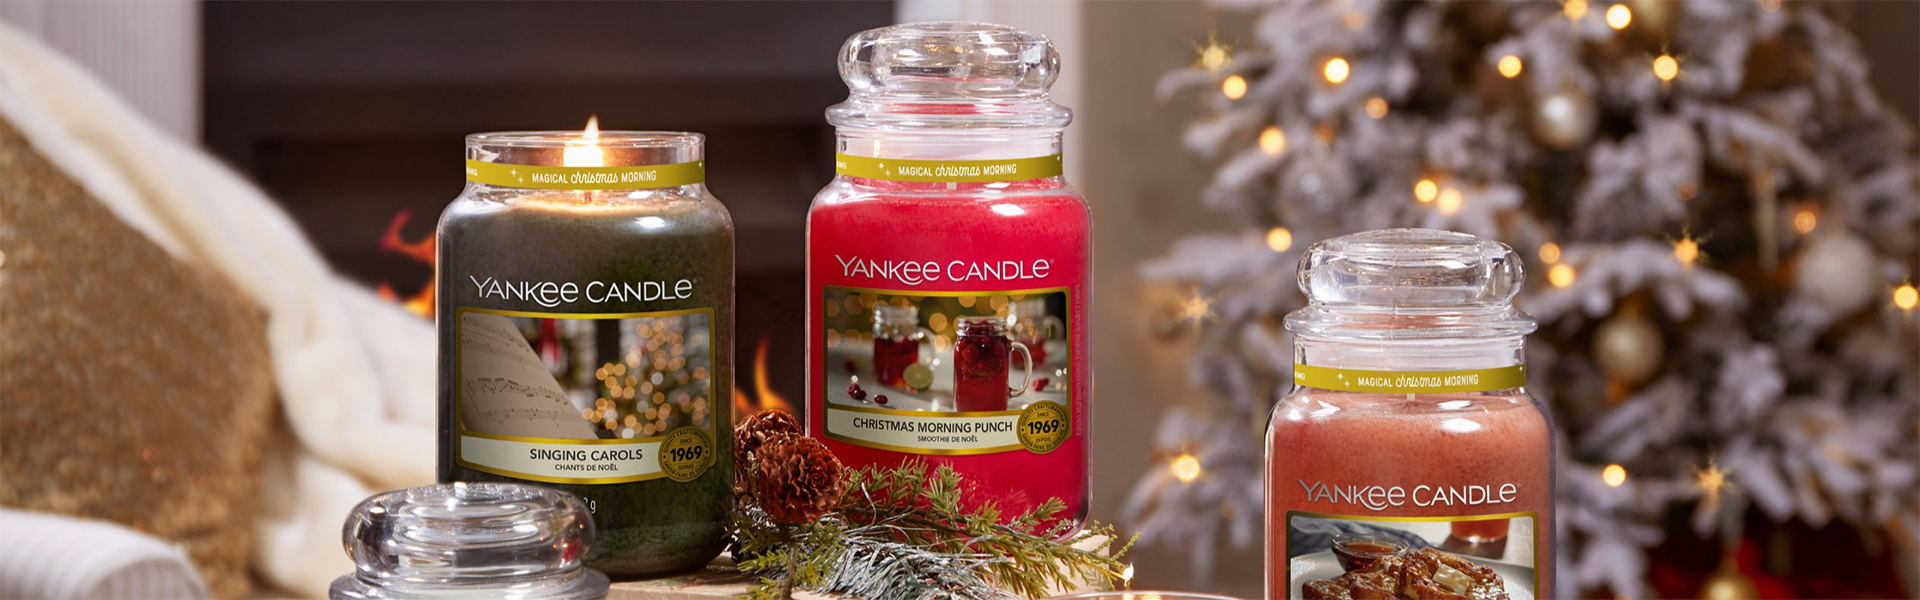 "<p data-aos=fade-up style=""text-align:center""><strong>Yankee Candle</strong></p>  <p data-aos=fade-up style=""text-align:center"">Christmas collection</p>"